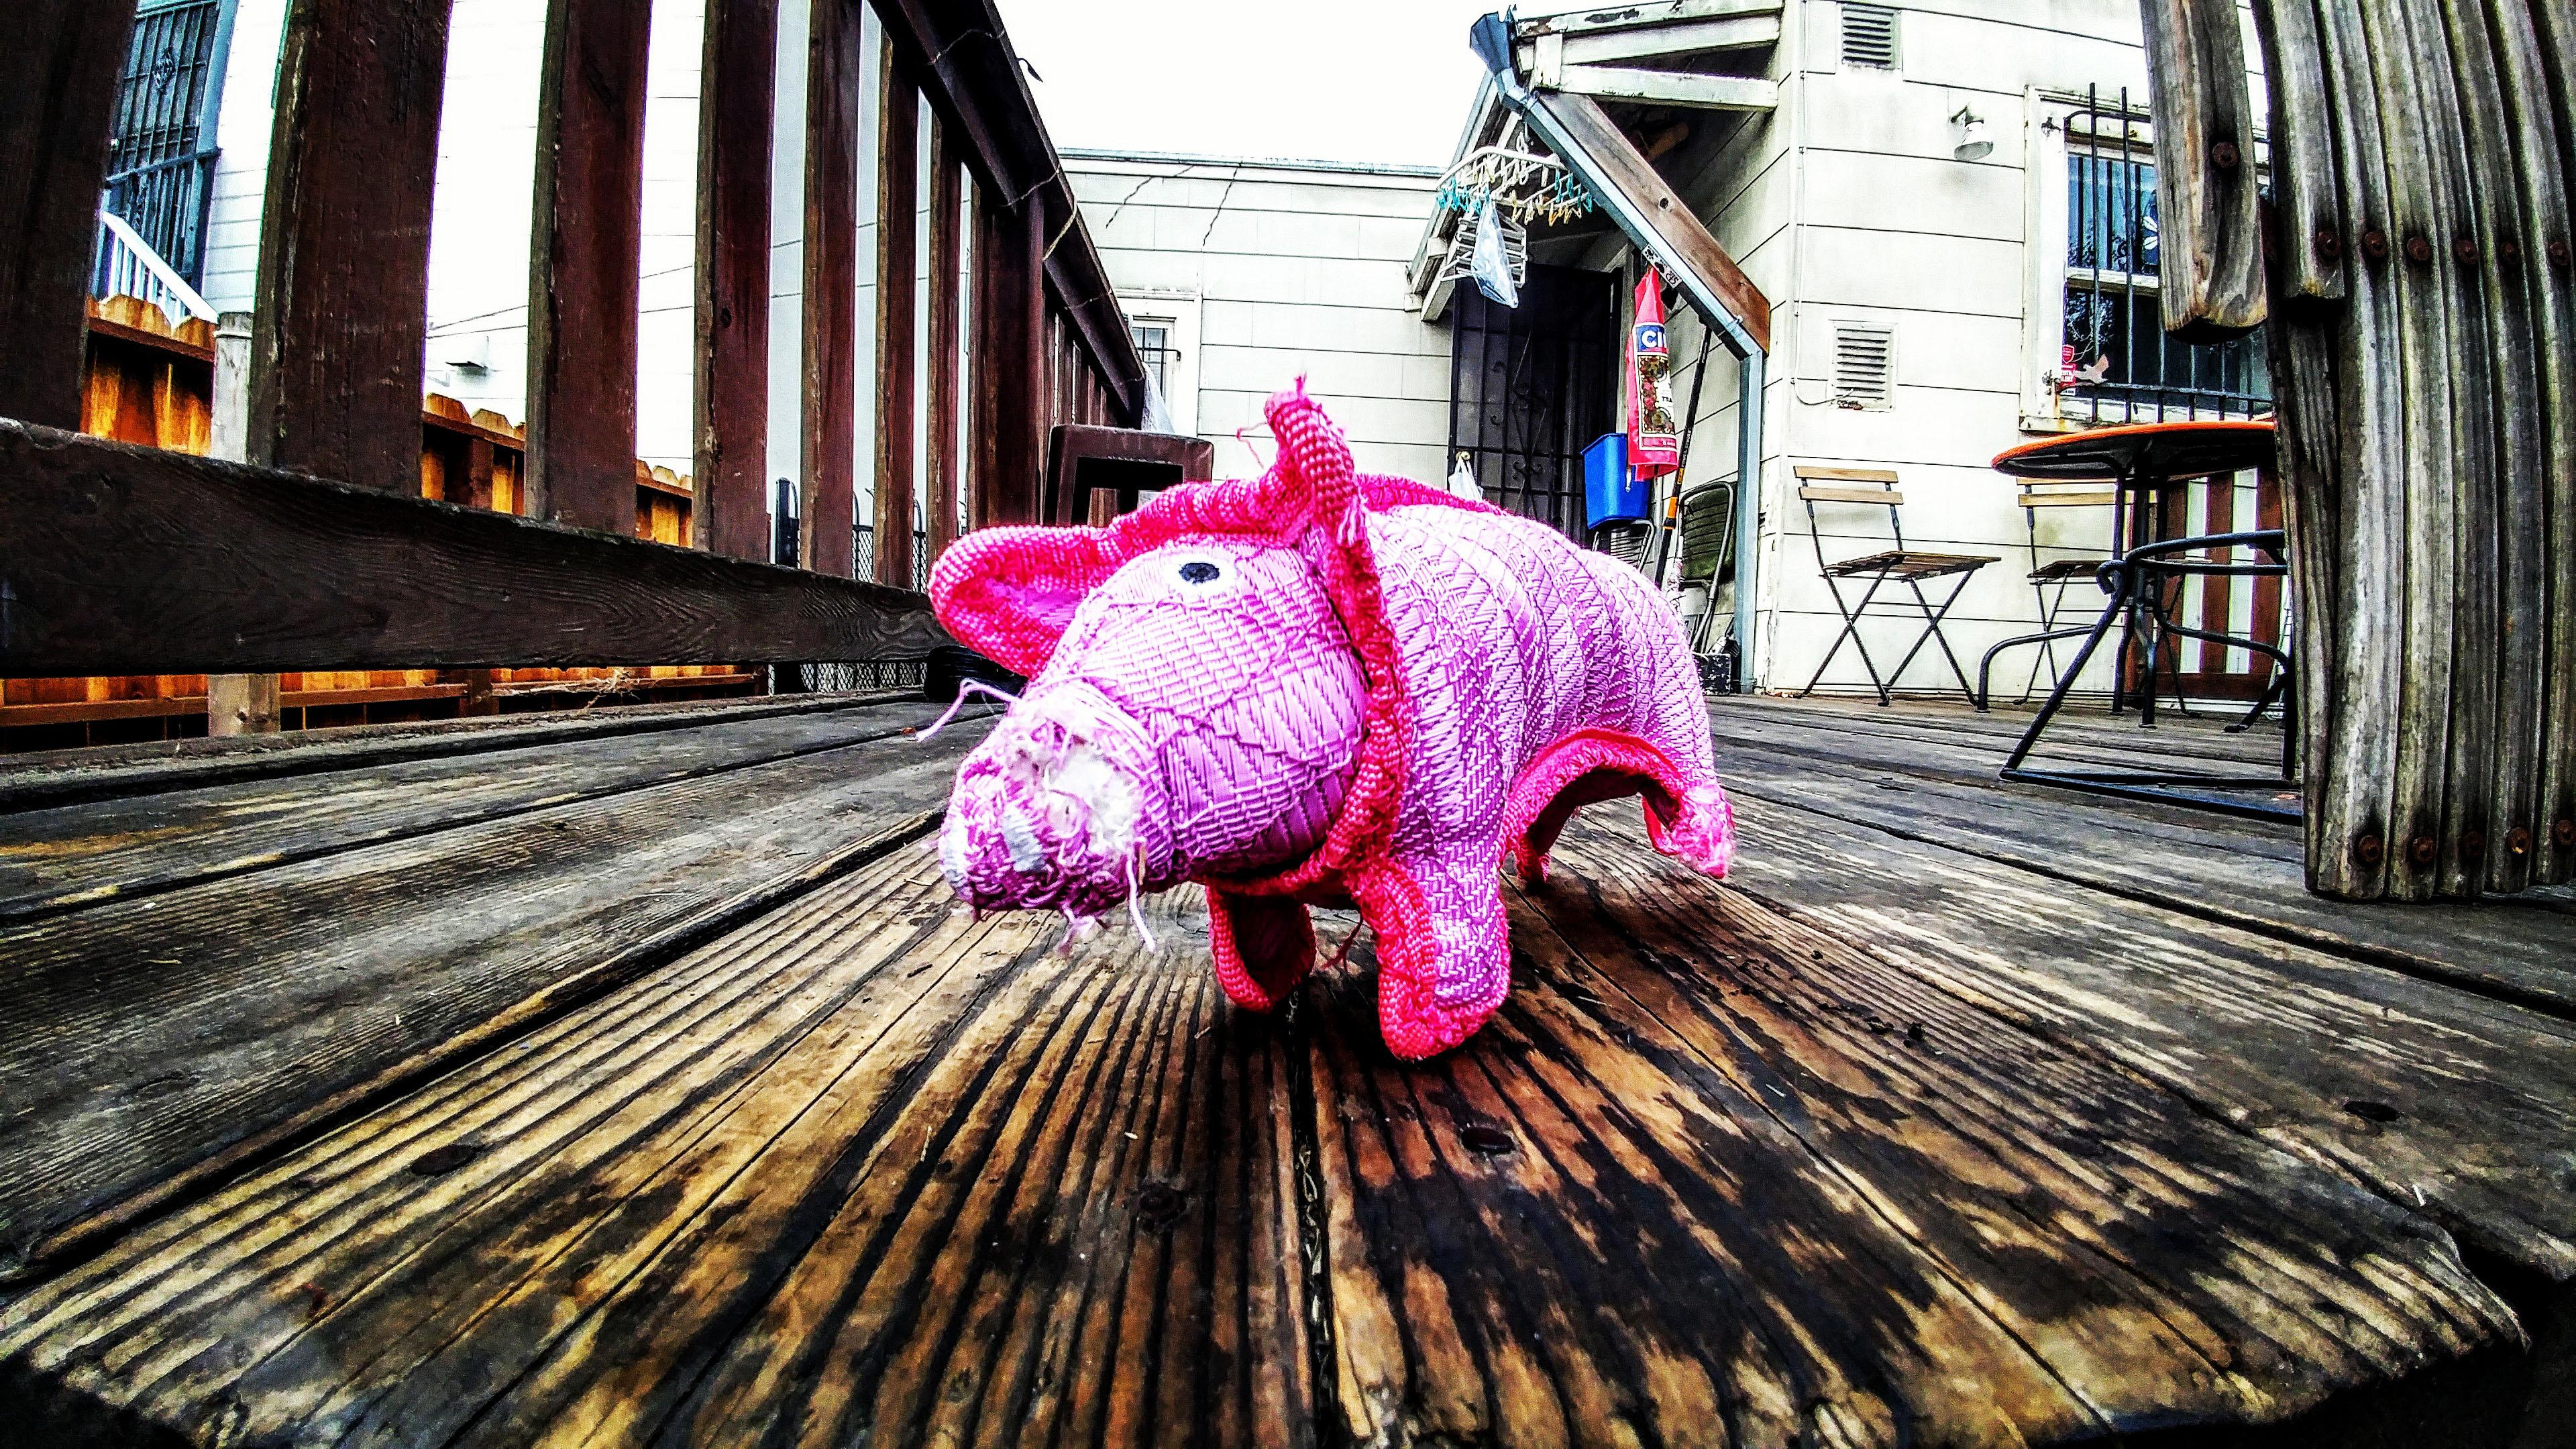 pig on deck (2019)